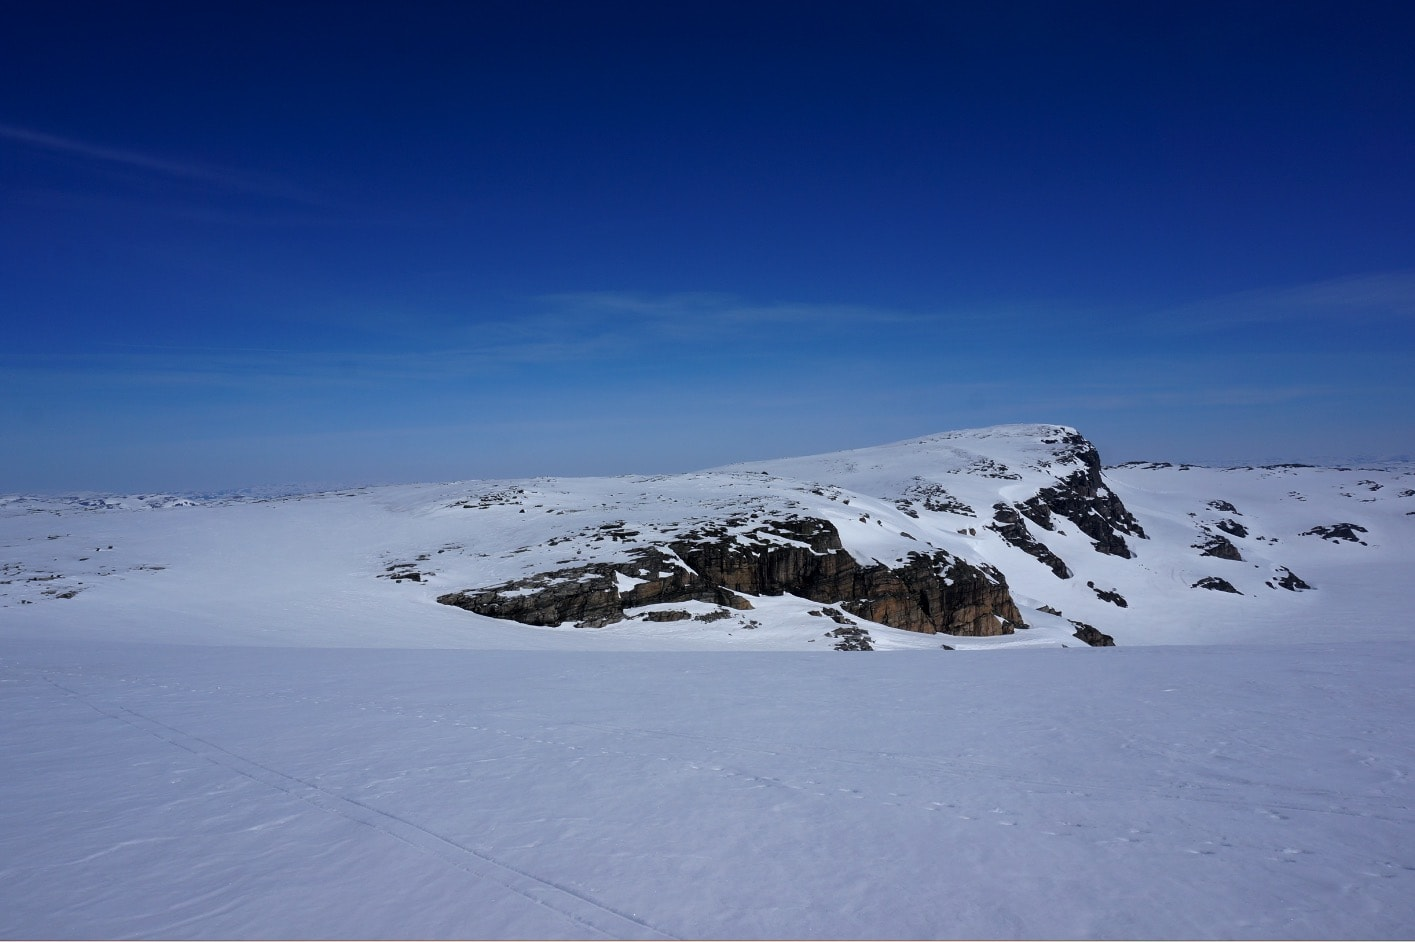 sandfloegga-gjermund nordskar